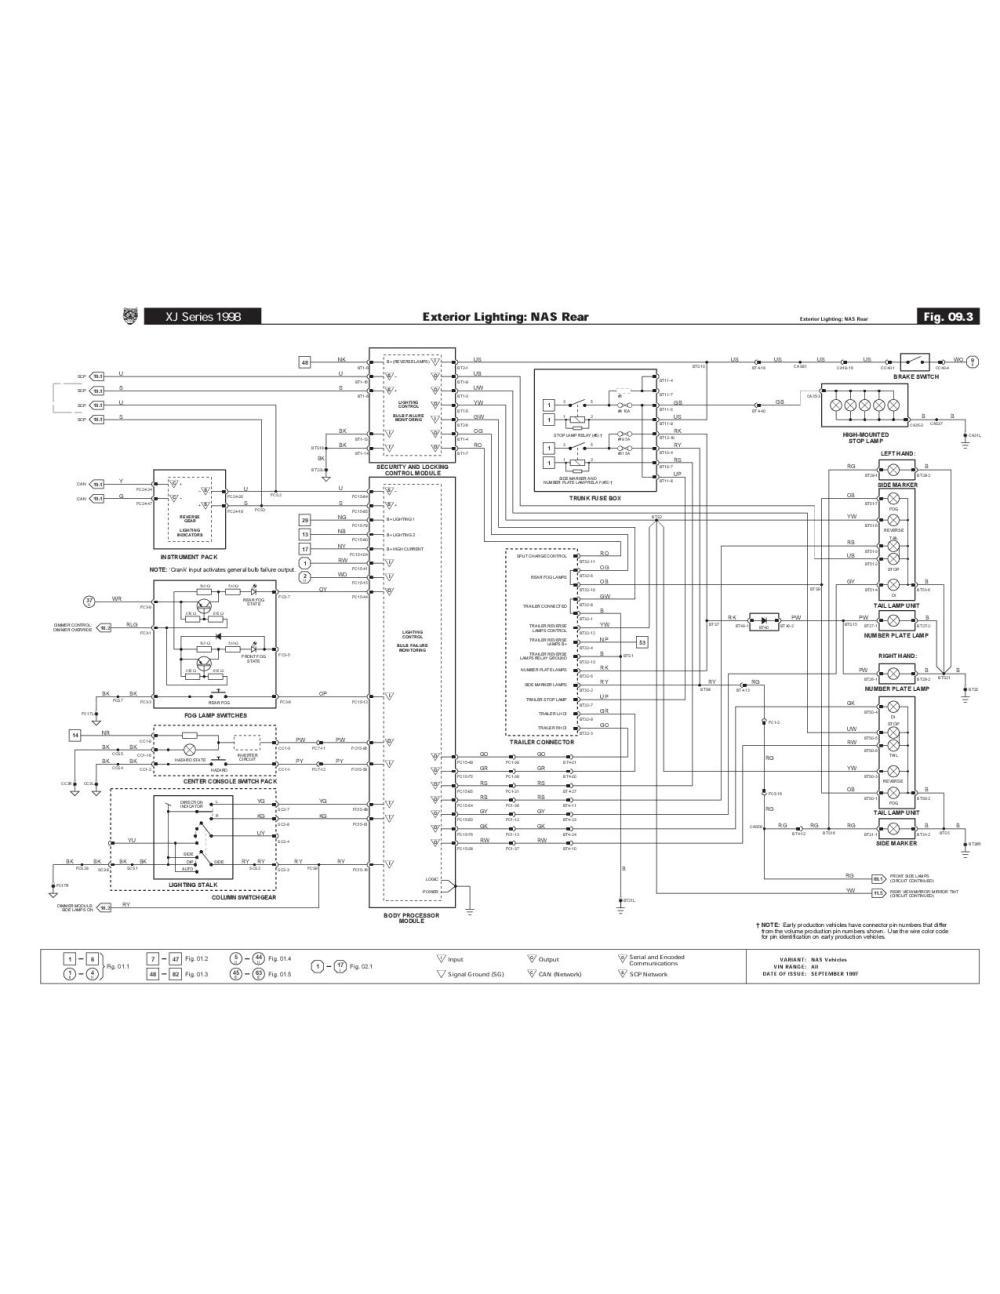 medium resolution of 1998 xjr fuse box diagram 25 wiring diagram images 1994 jaguar fuse box diagram 1994 jaguar fuse box diagram